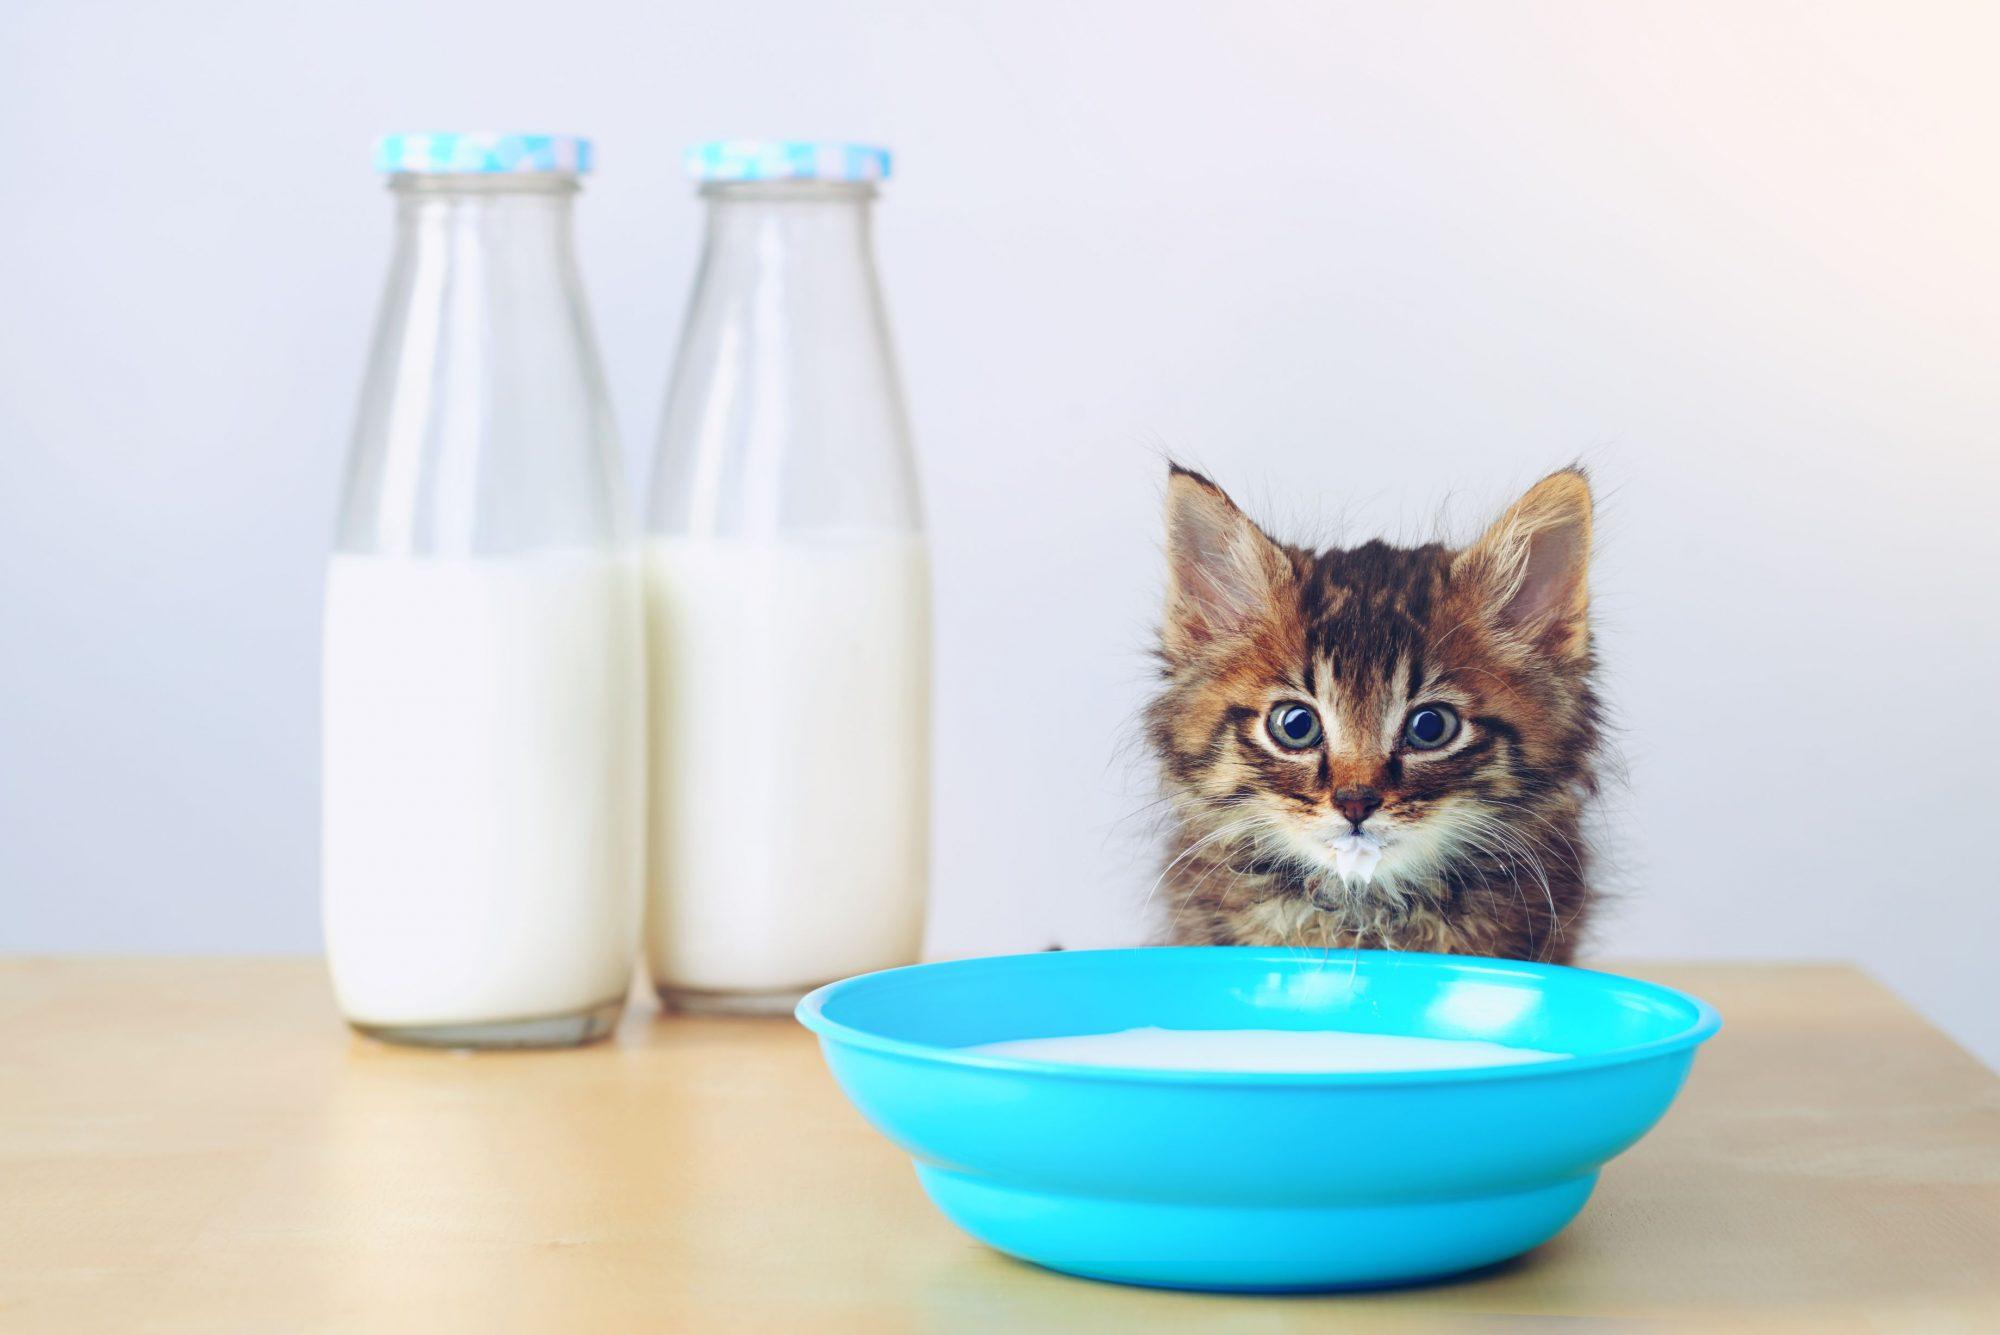 Cat next to bowl of milk.